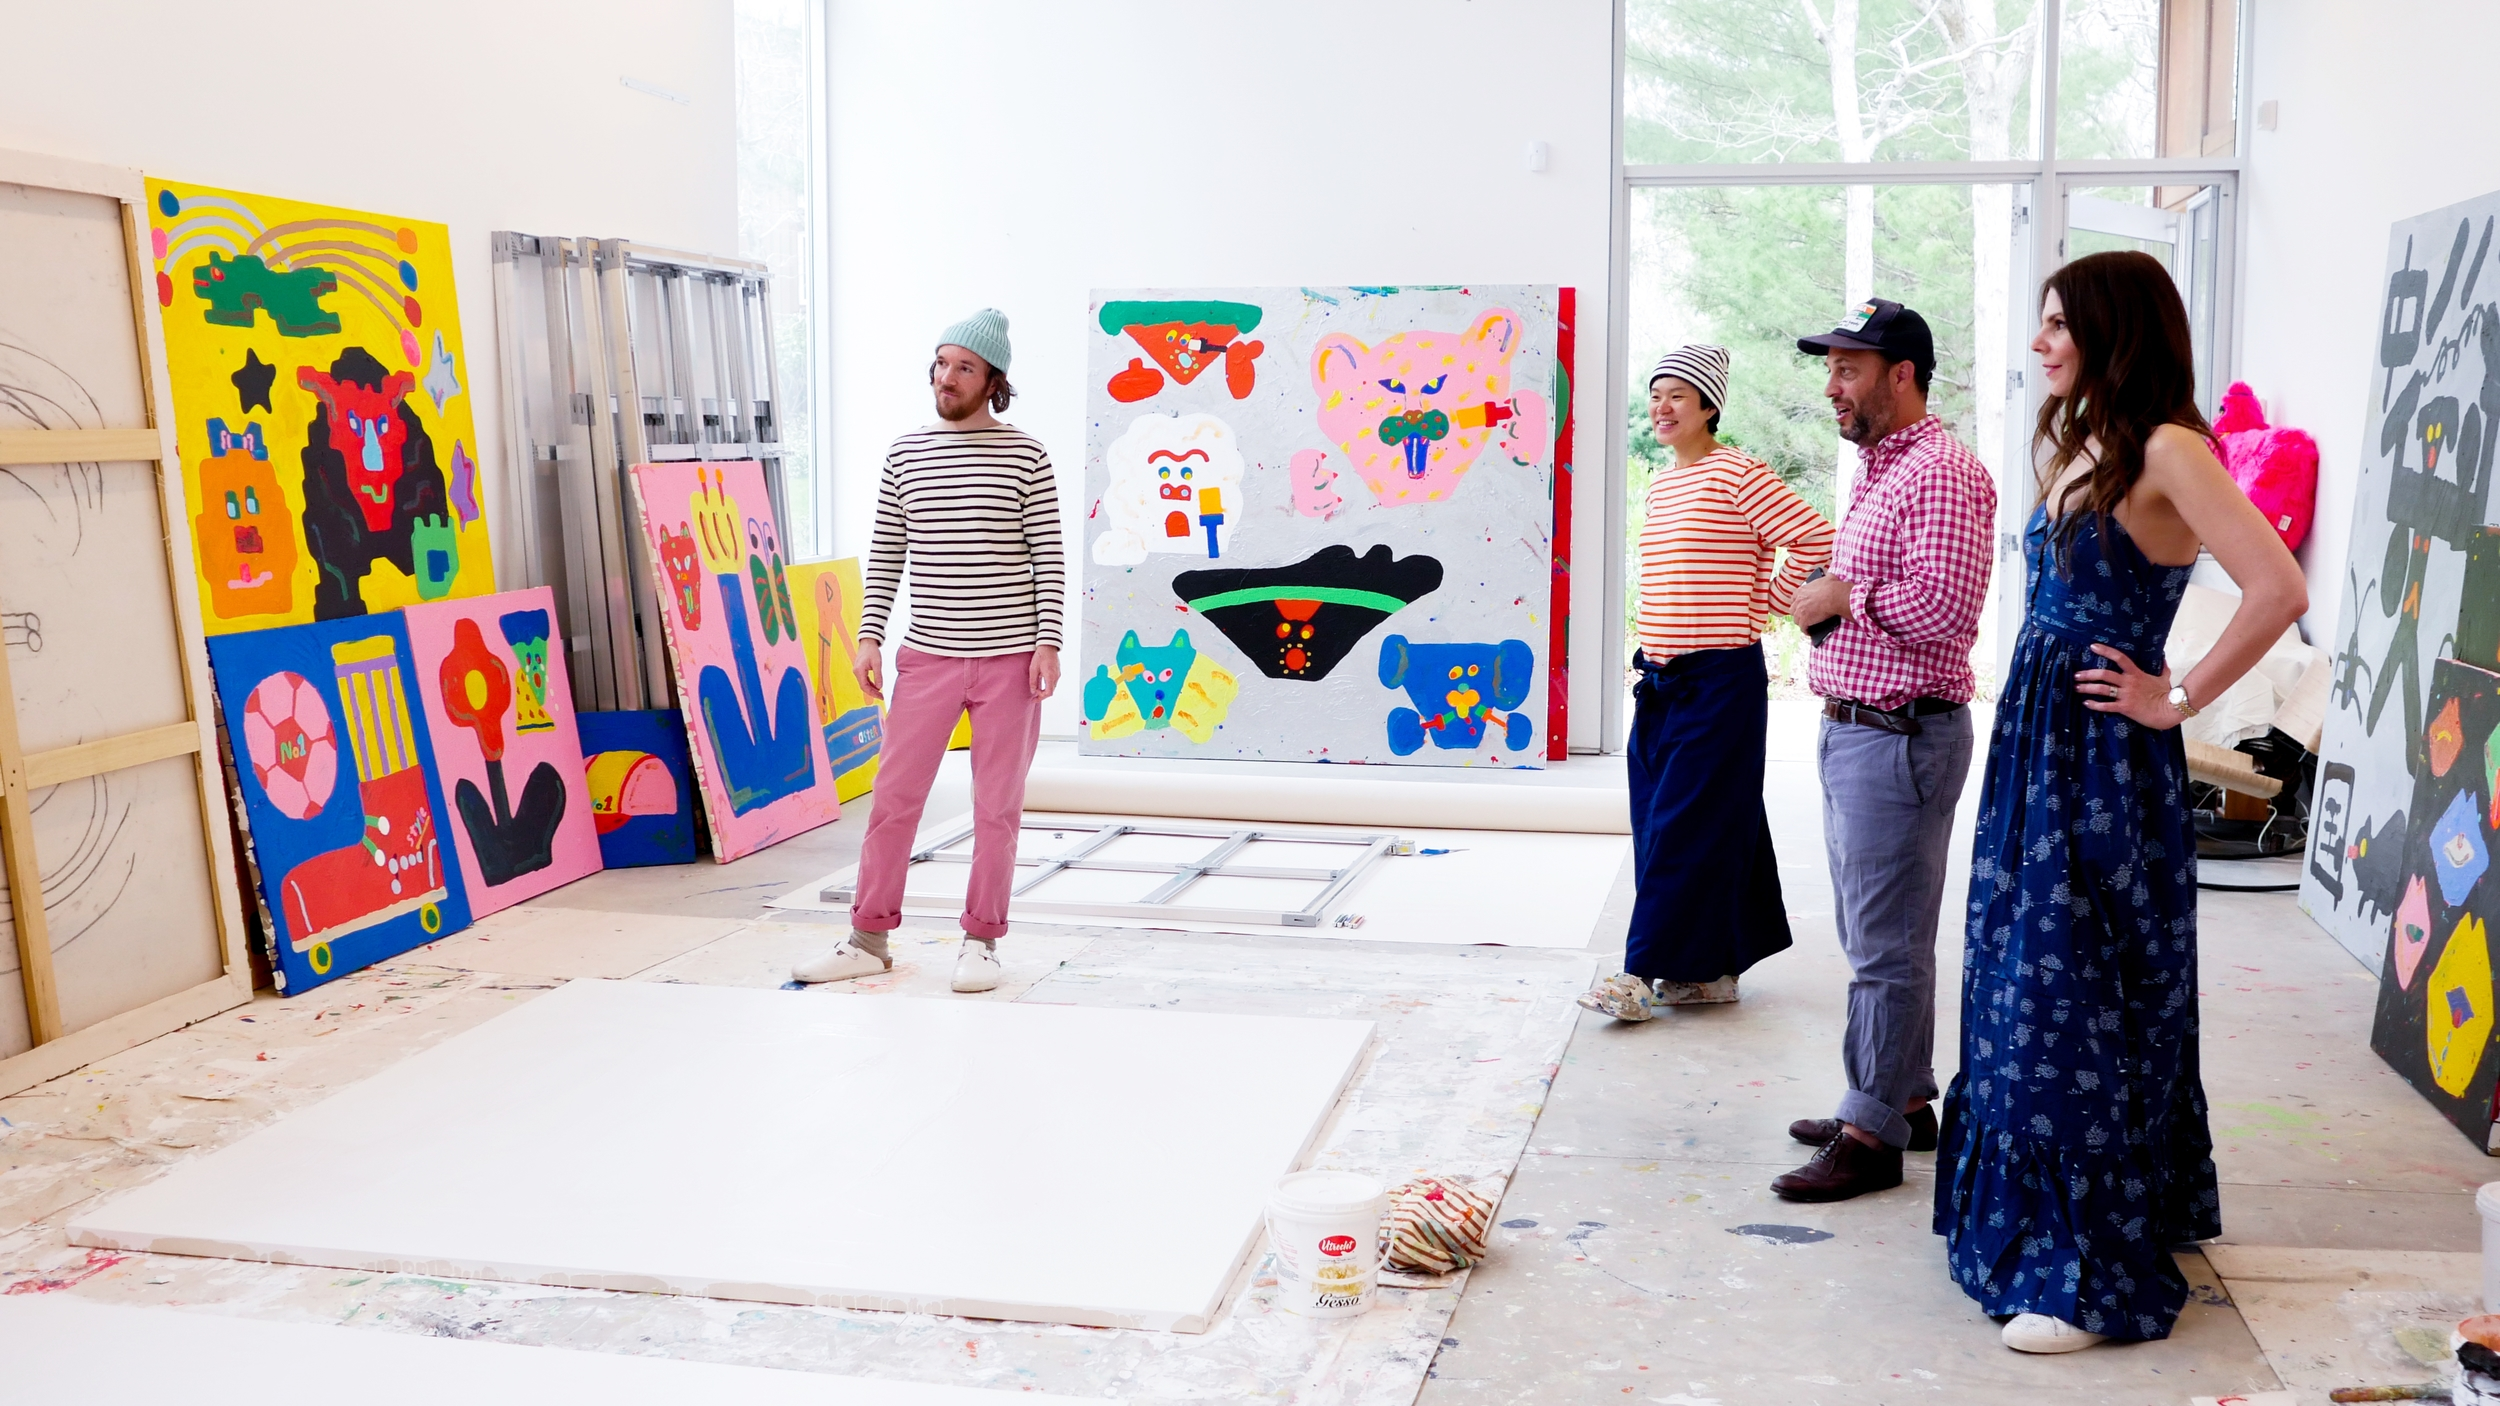 Justin Waldron, Misaki, Eric Firestone and I admire the amazing work that Kawai has created in the East Hampton studio since January